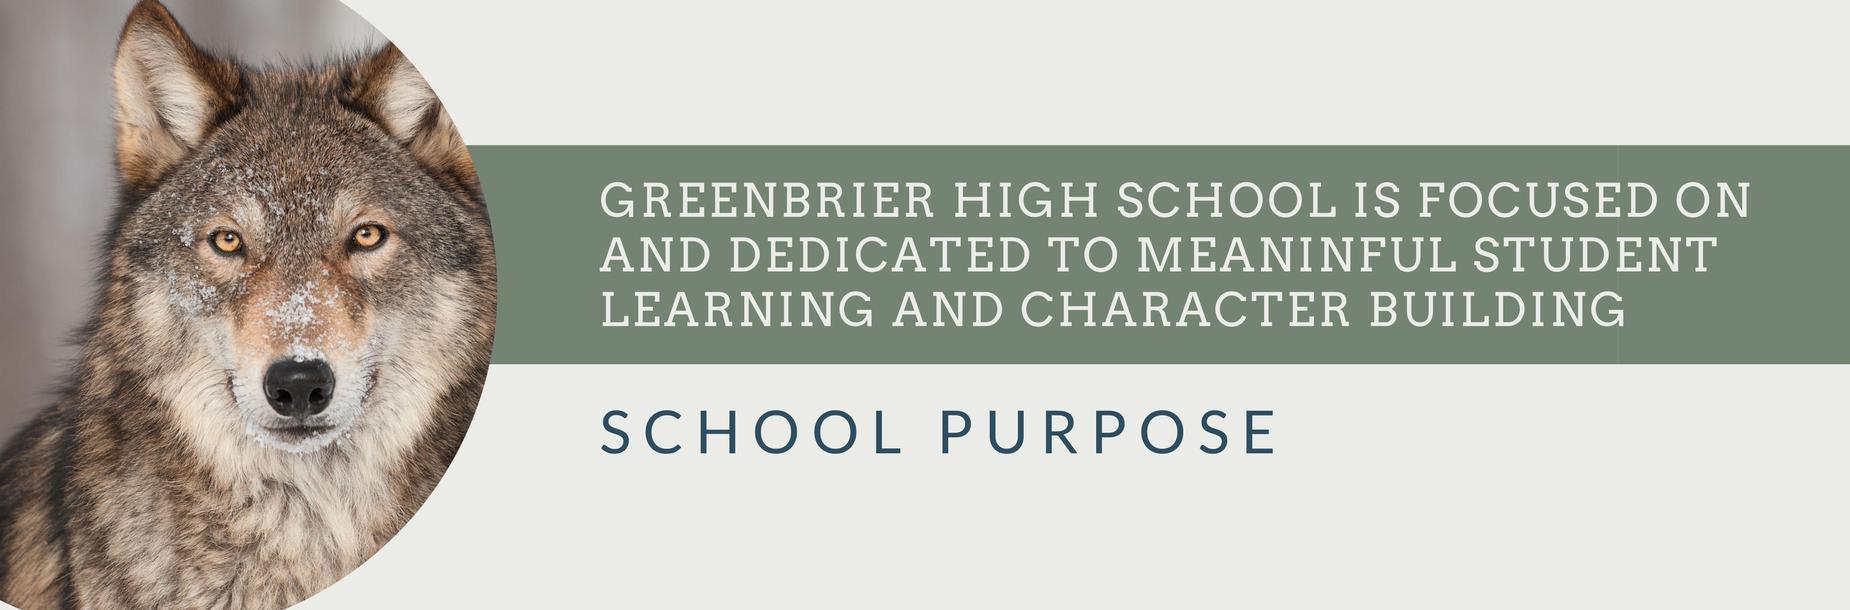 School purpose